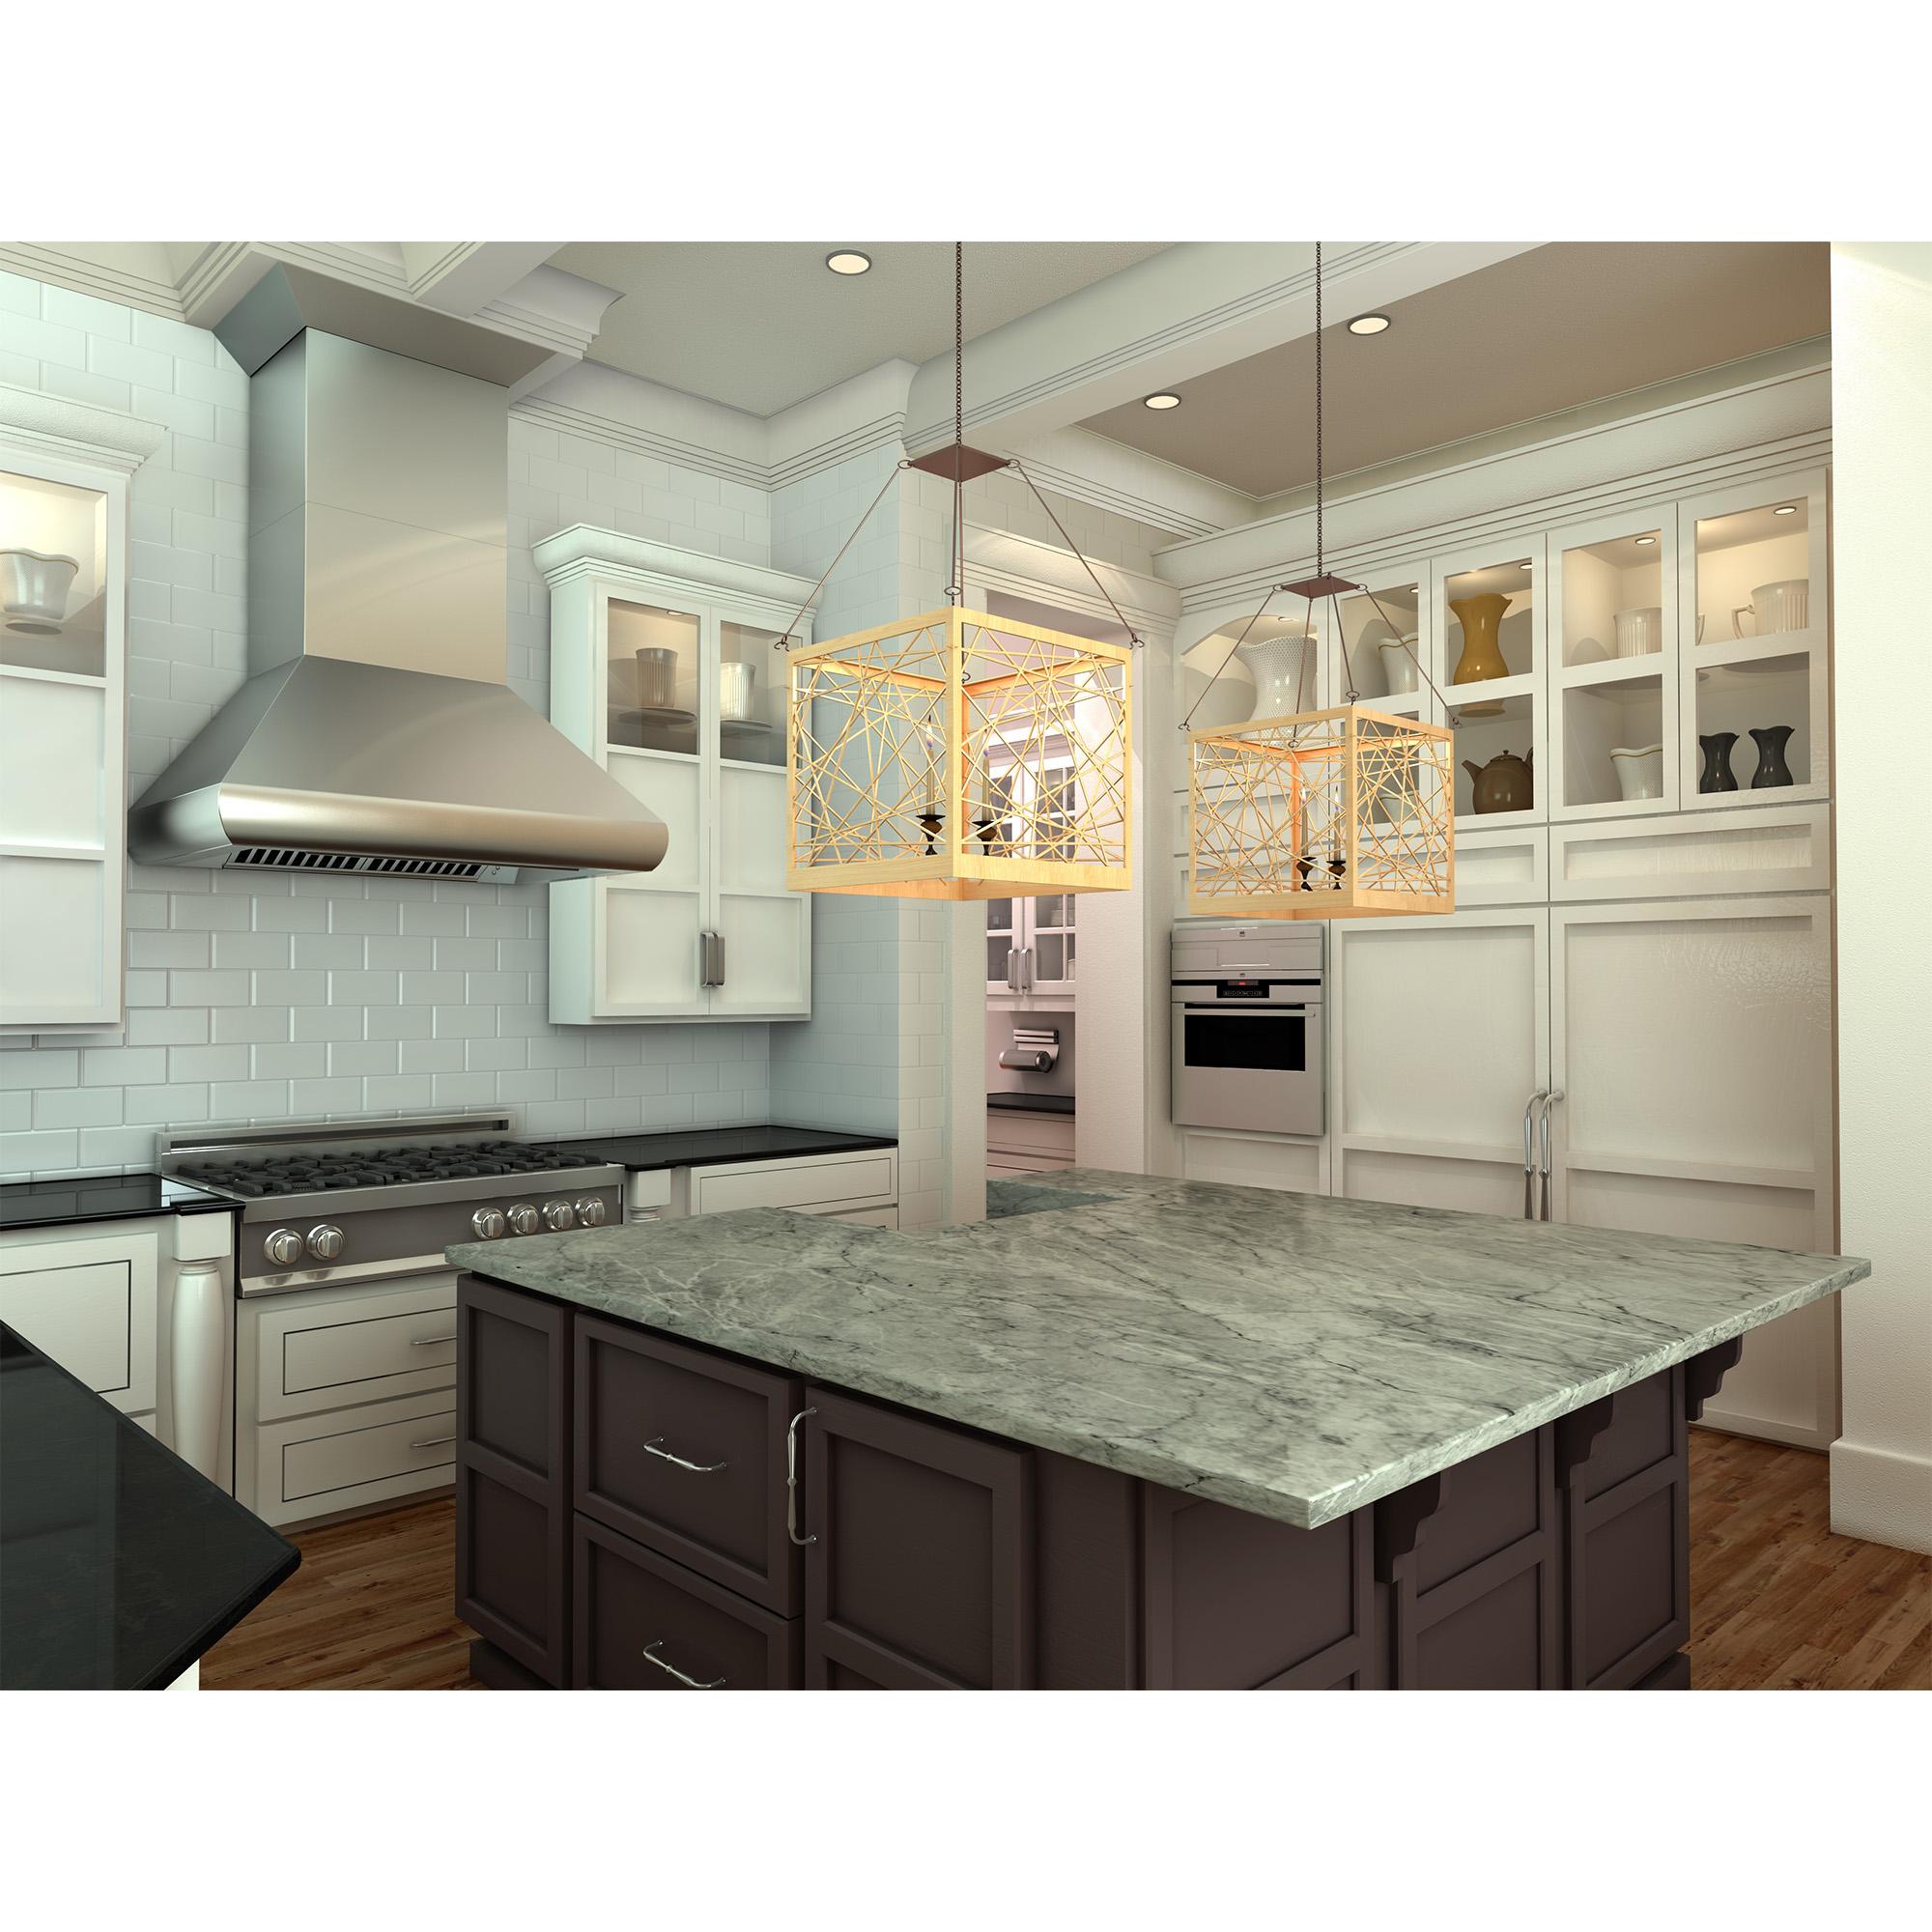 zline-stainless-steel-wall-mounted-range-hood-687-kitchen 1.jpg